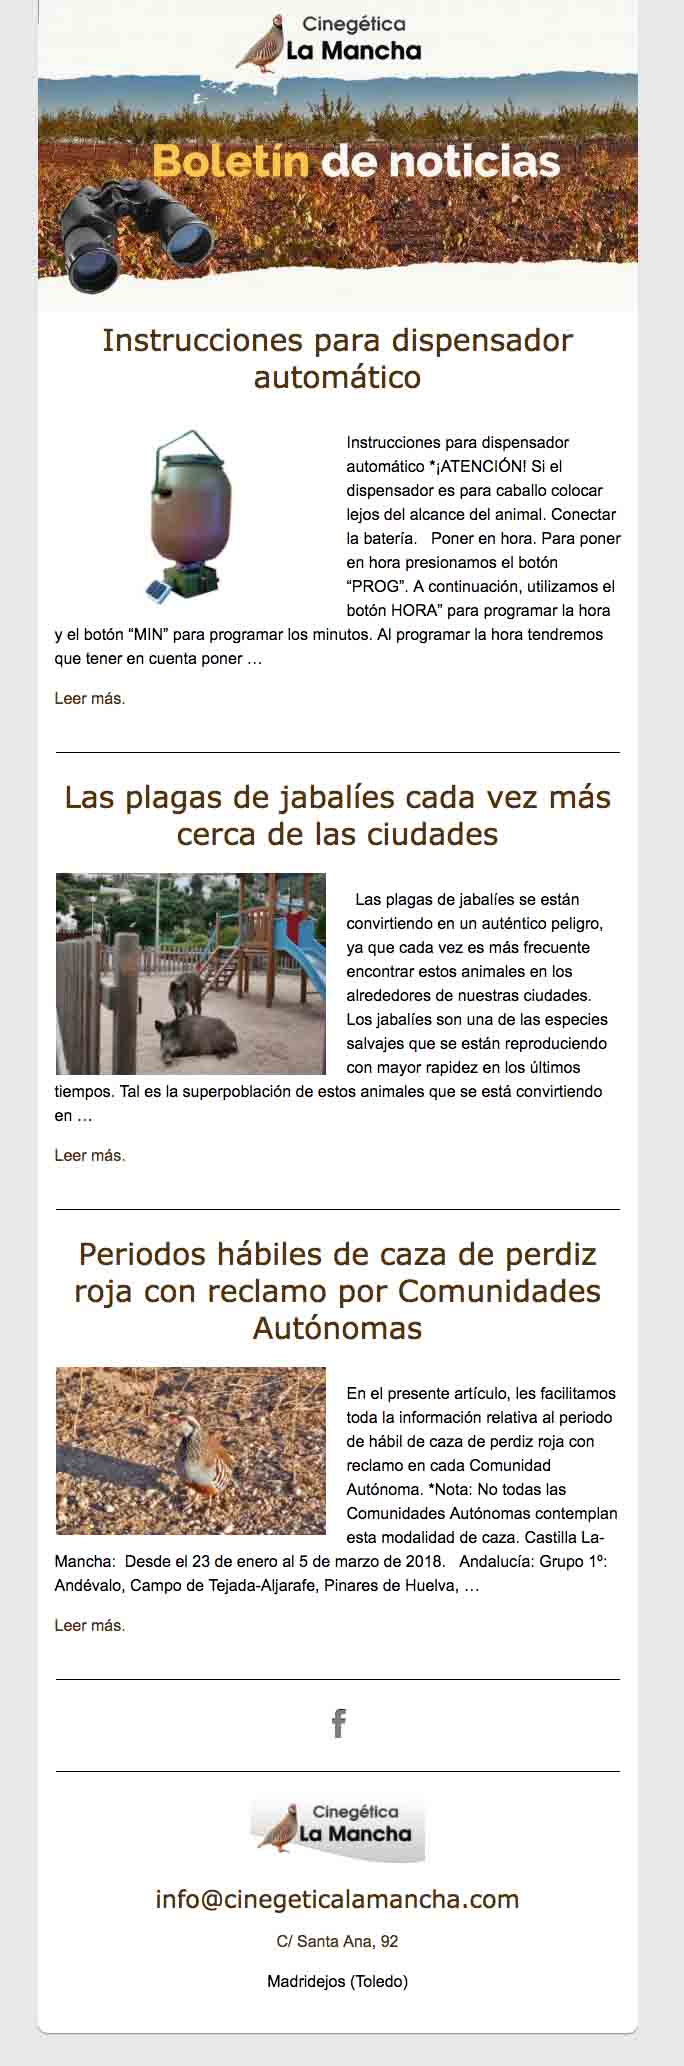 Mailing Cinegética La Mancha. Portafolio diseño web. Clara Ortega. Aclararte